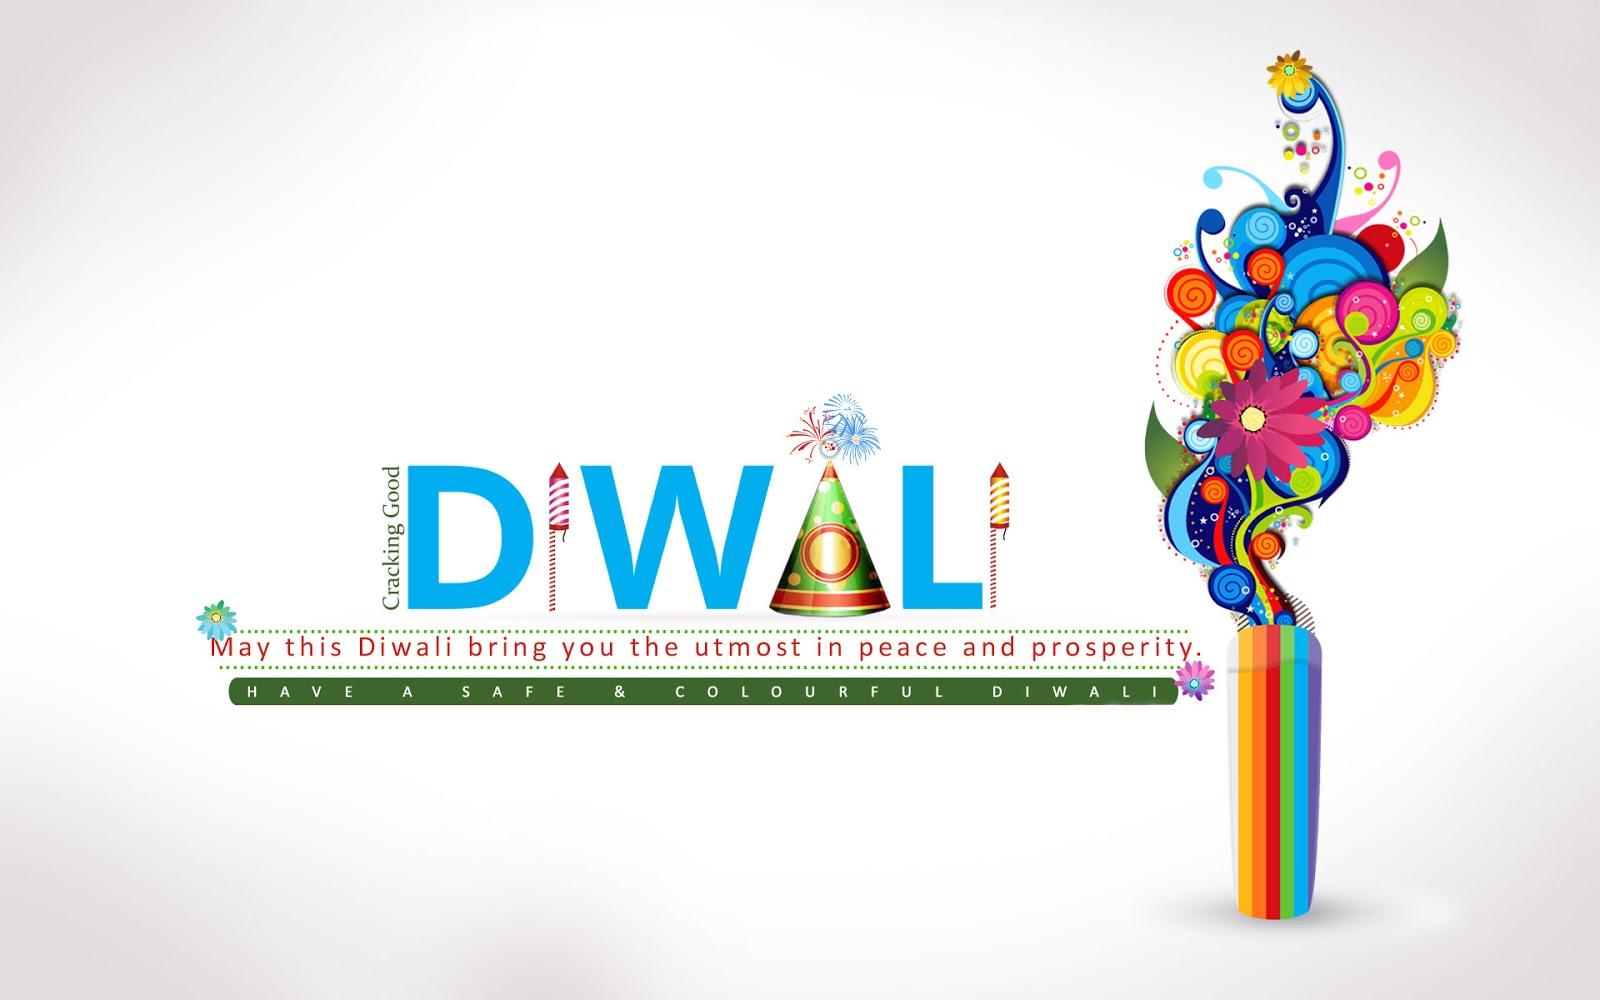 Happy diwali deepawali deepavali pictures with wishes messages happy diwali deepawali deepavali pictures with wishes messagesgreetings messages m4hsunfo